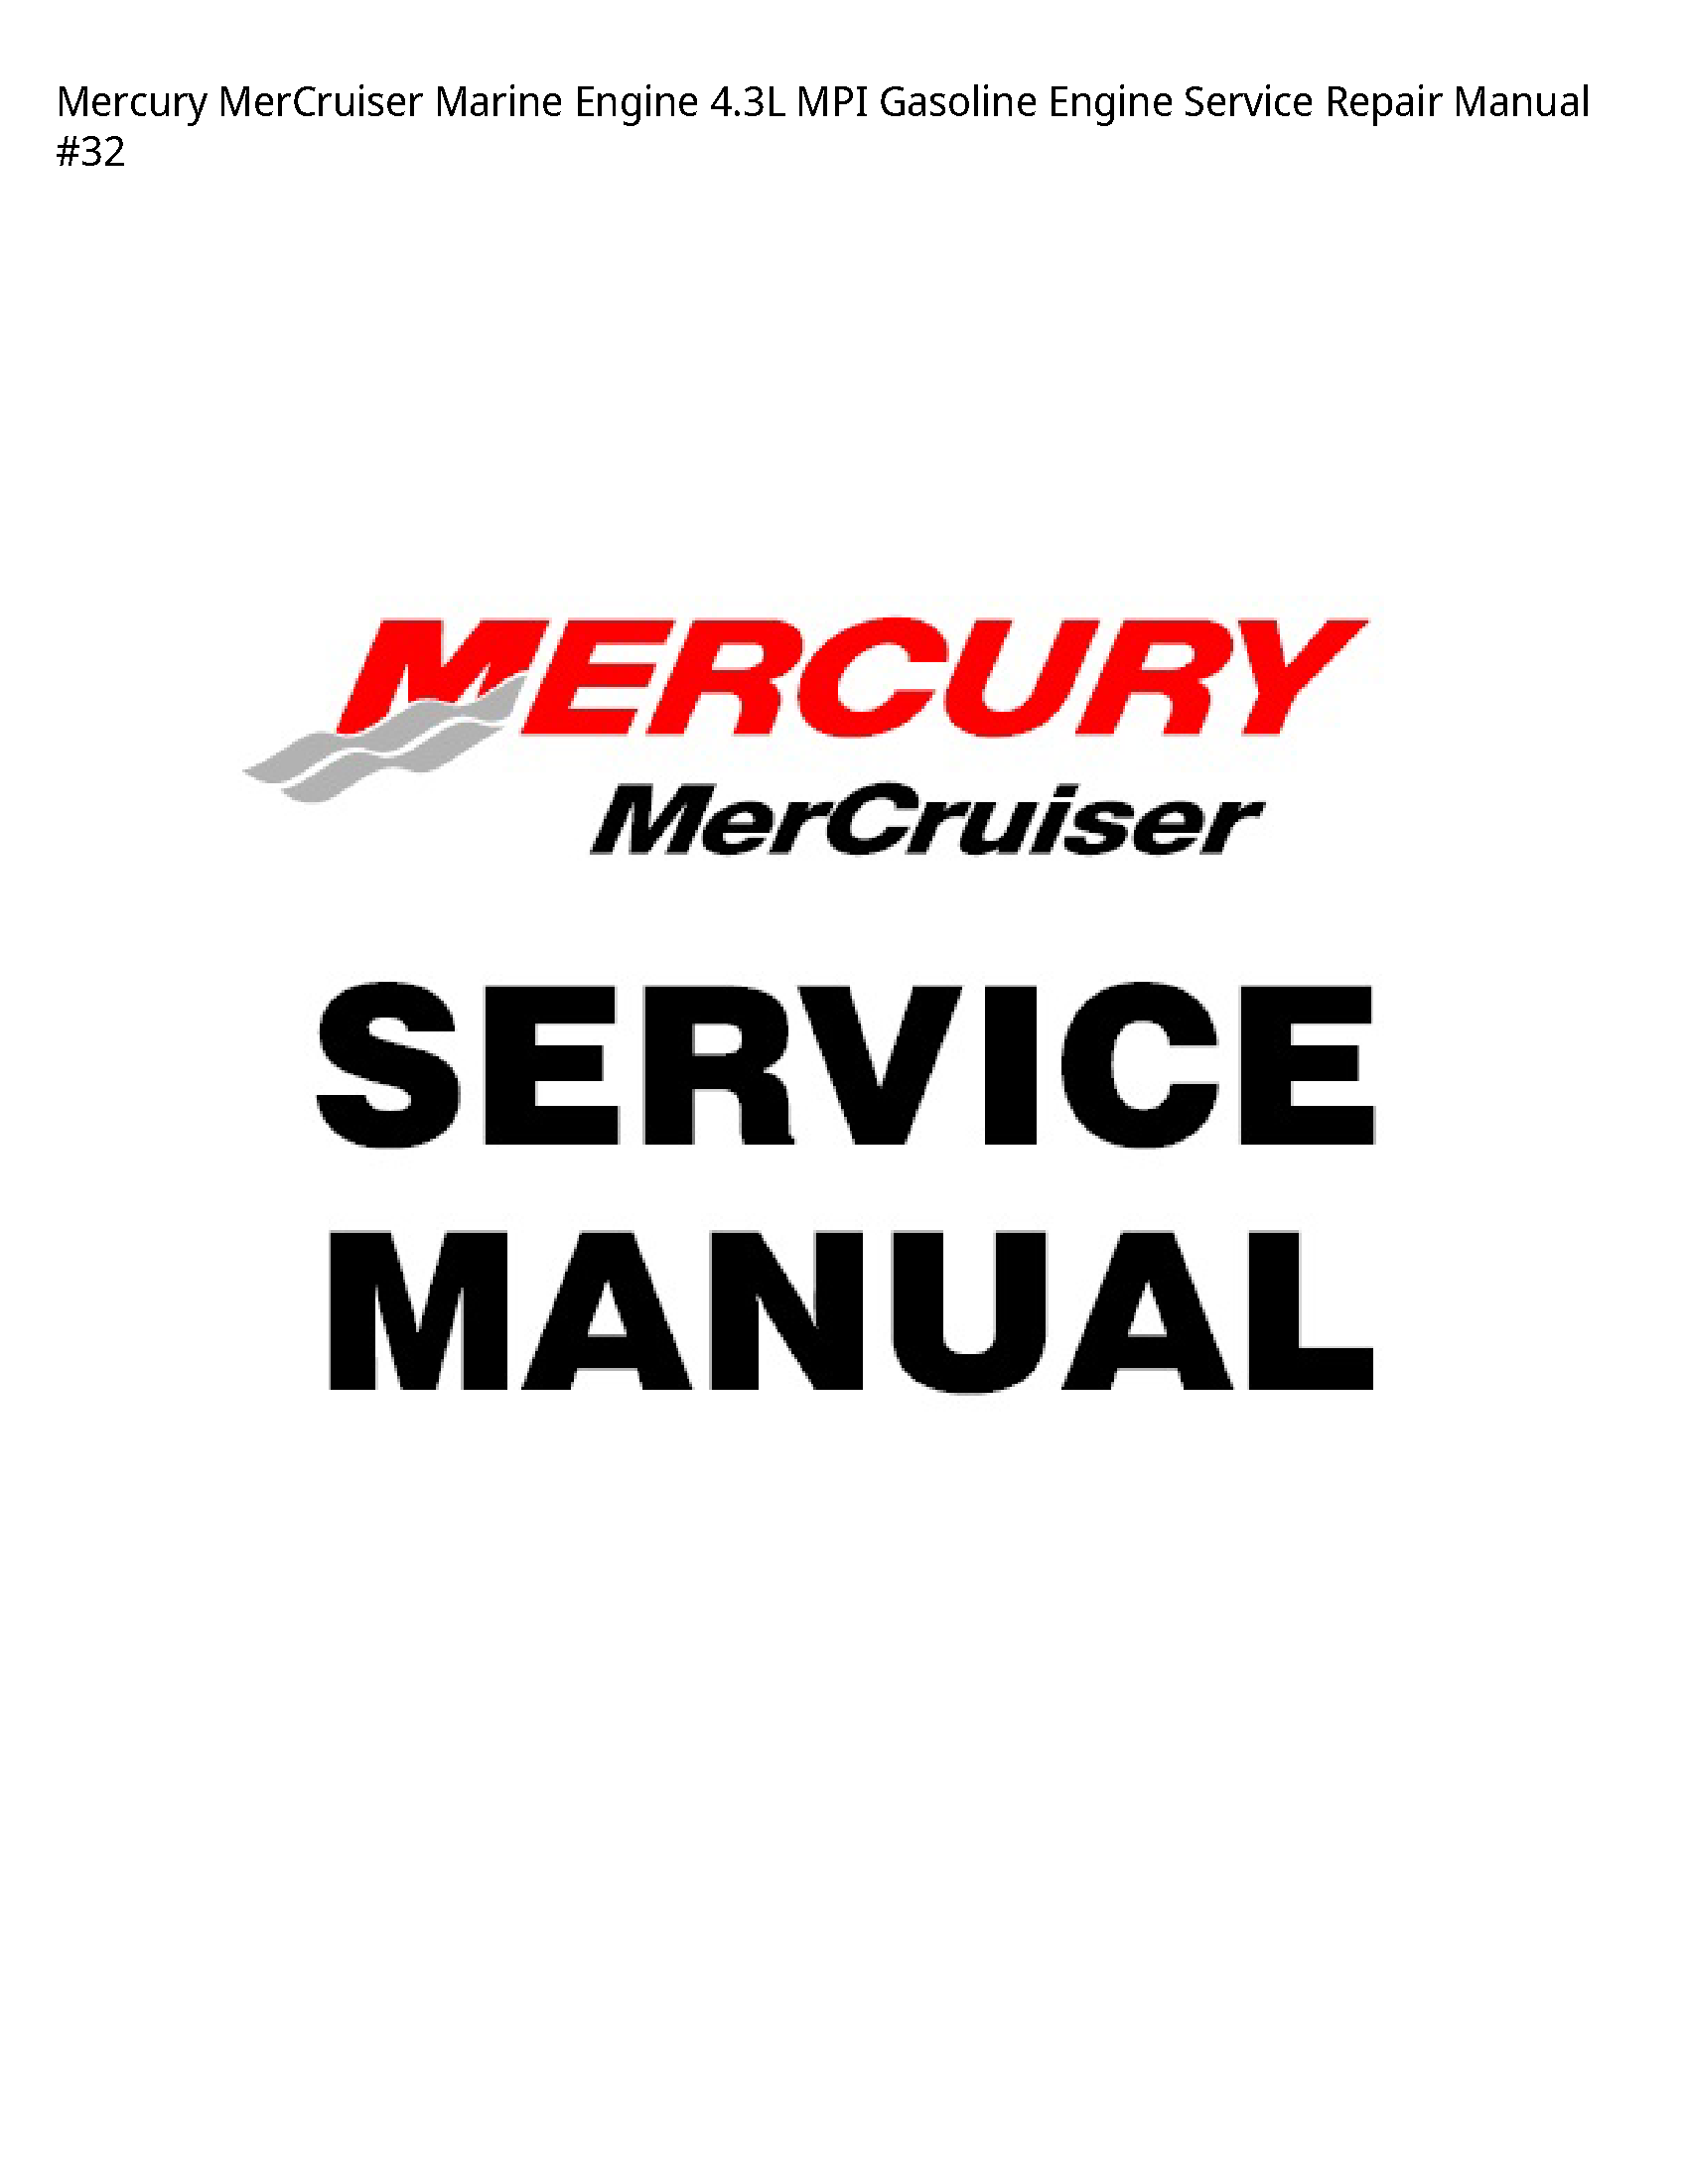 Mercury 4.3L MerCruiser Marine Engine MPI Gasoline Engine manual